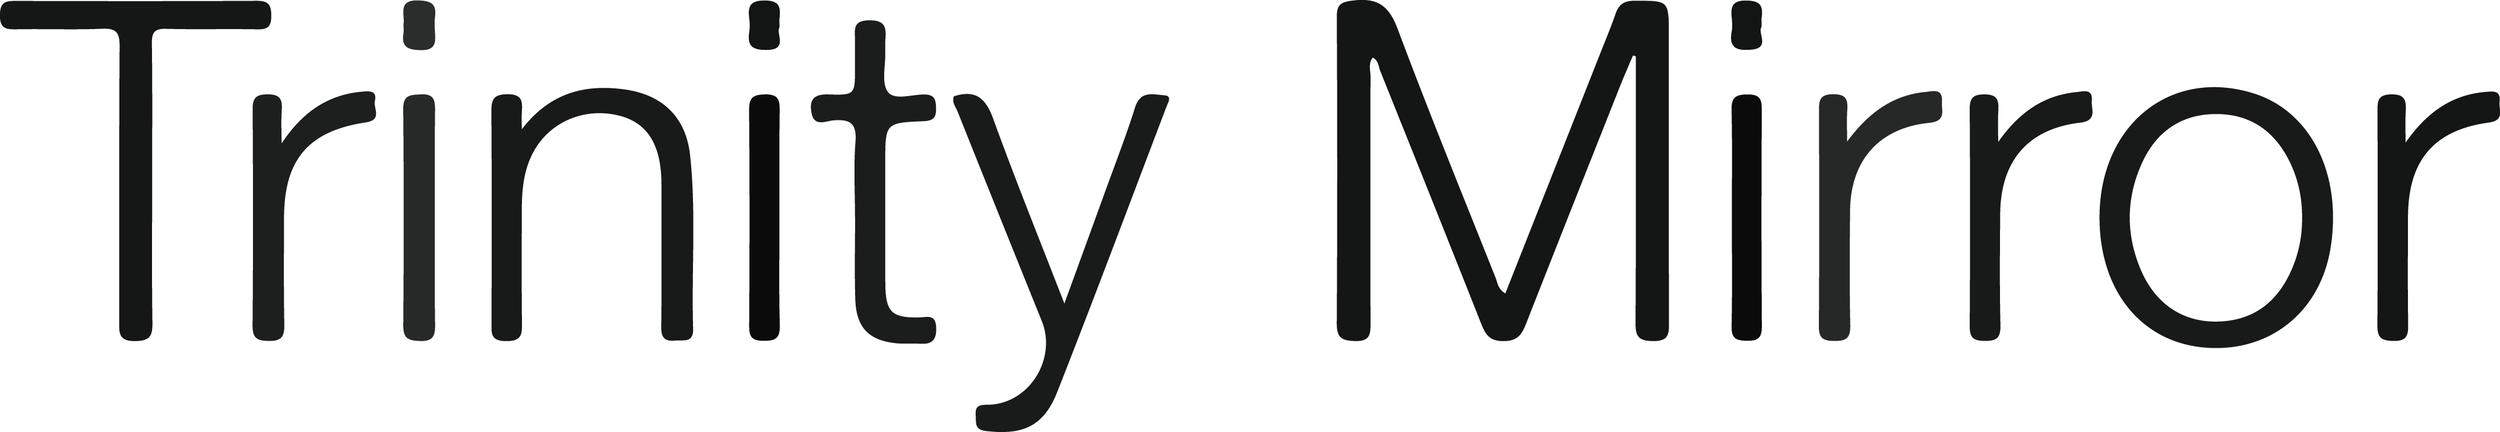 Logo_Trinity_Mirror.png